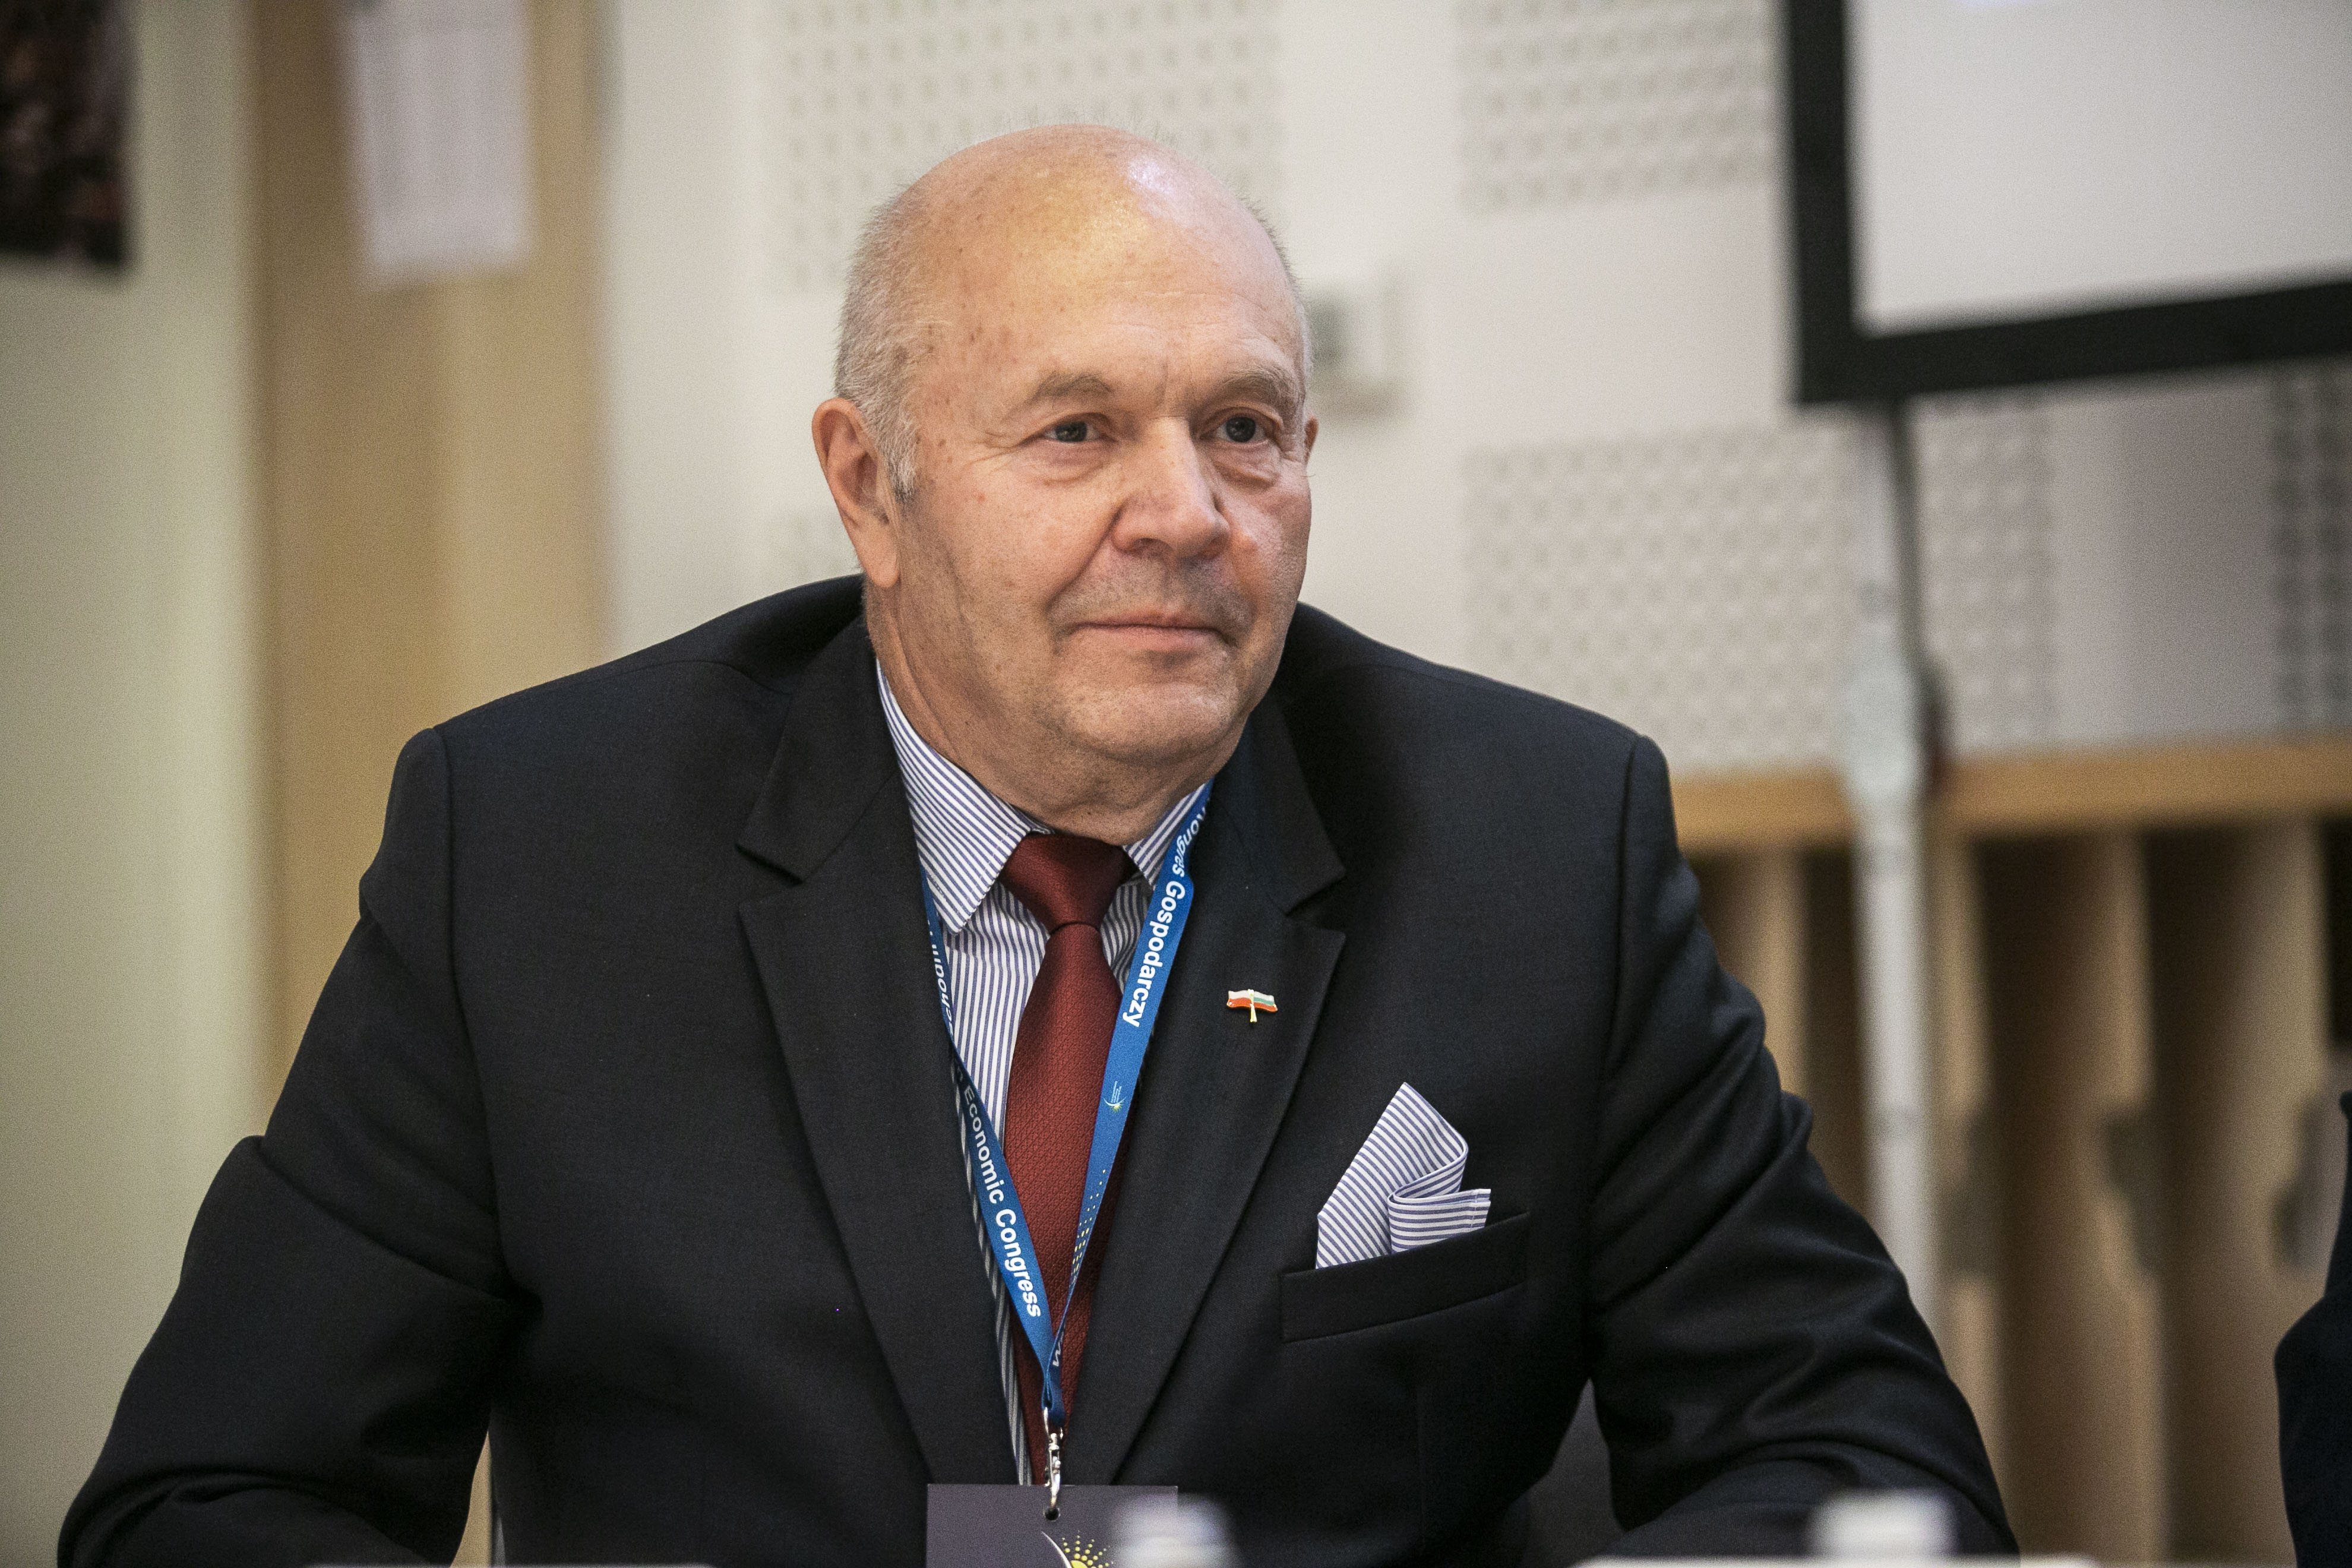 Wiceprezes Contractusa Witold Karczewski (Fot. PTWP)